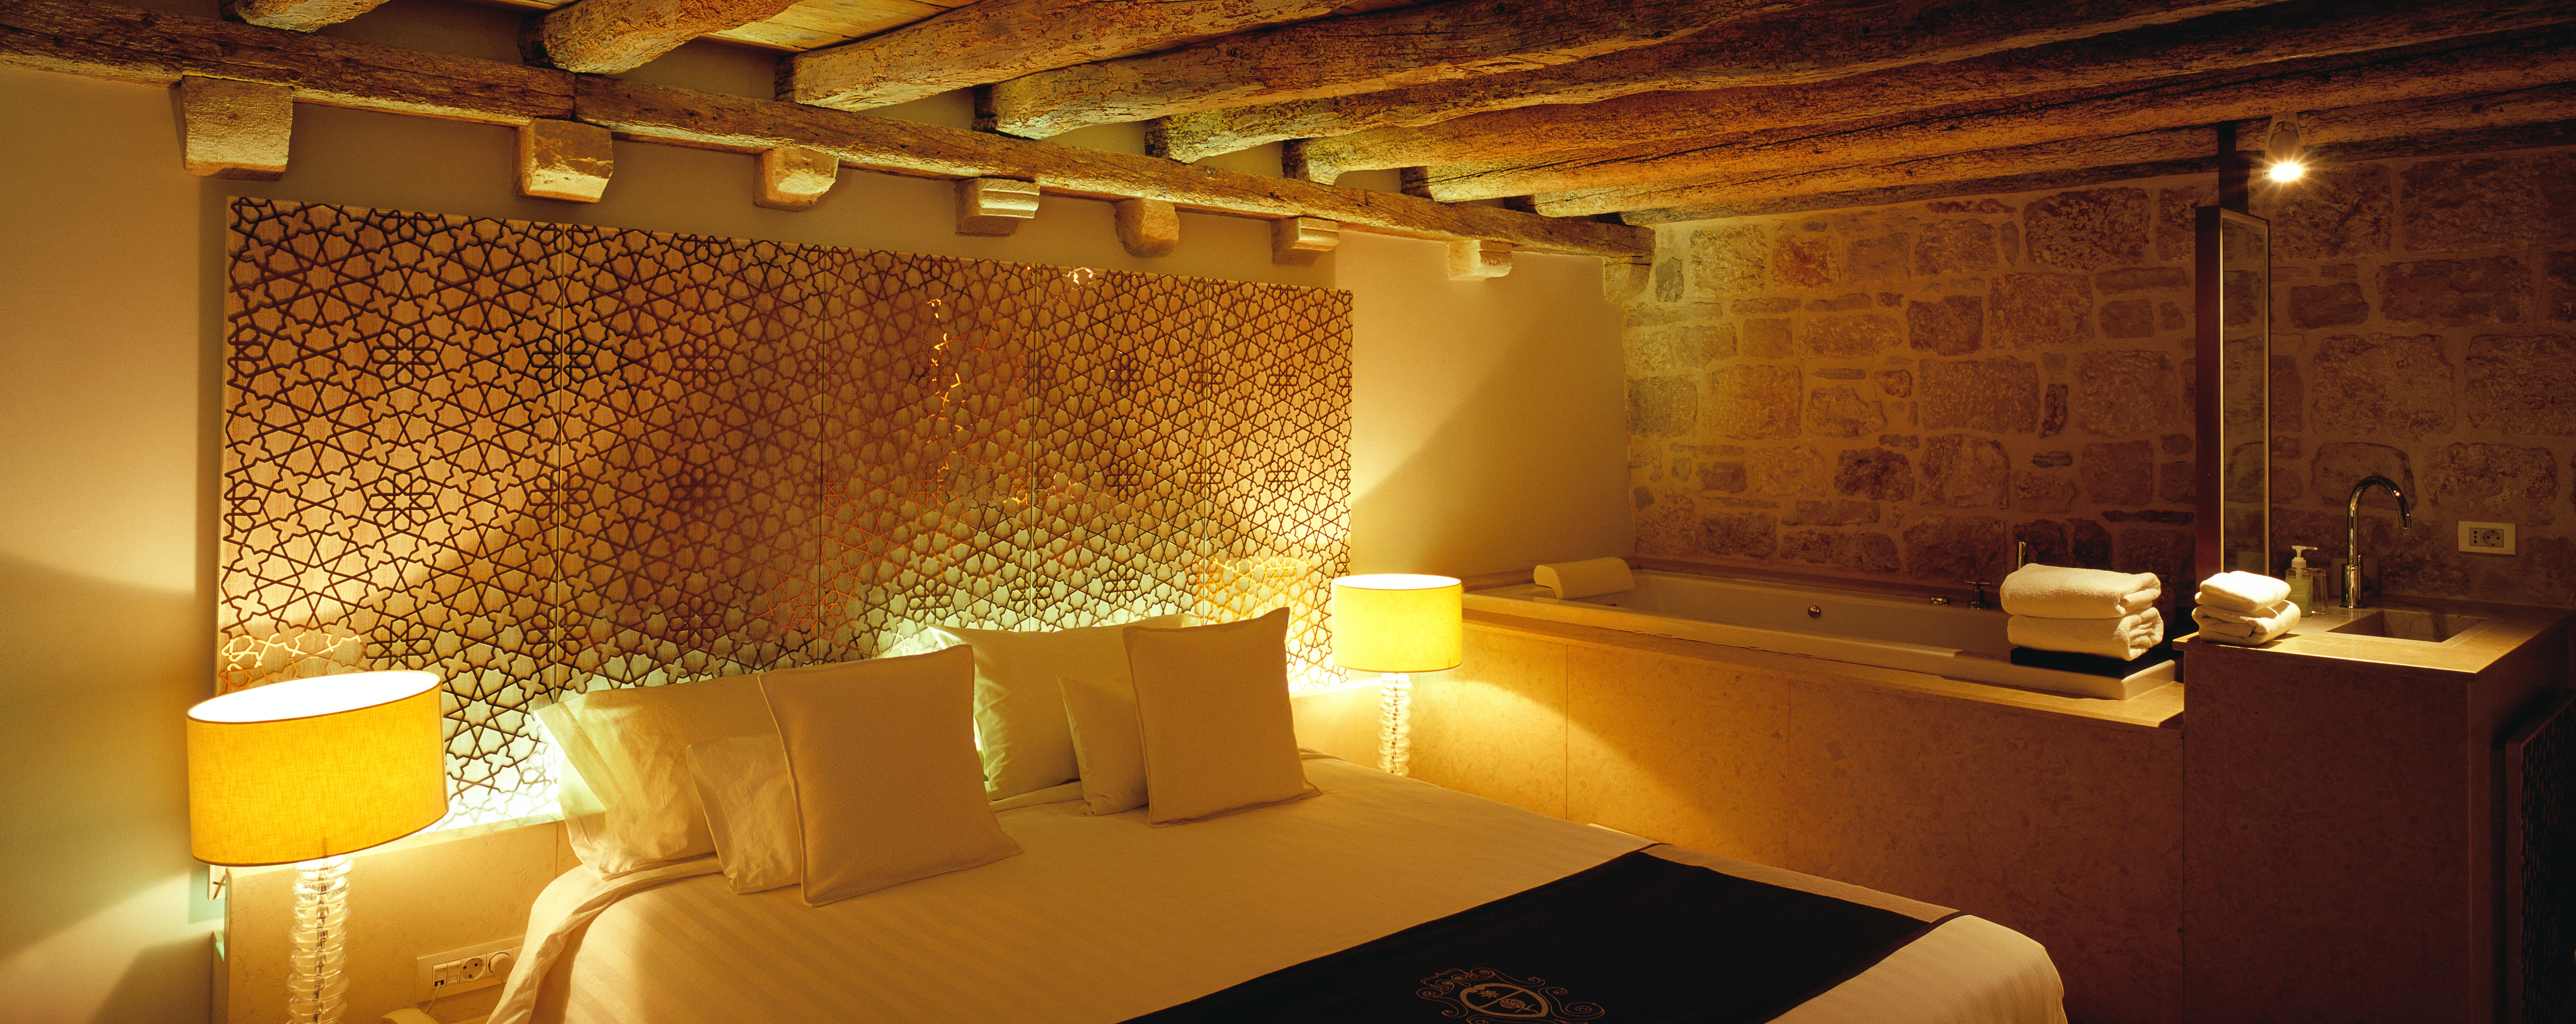 korcula-luxury-boutique-hotel